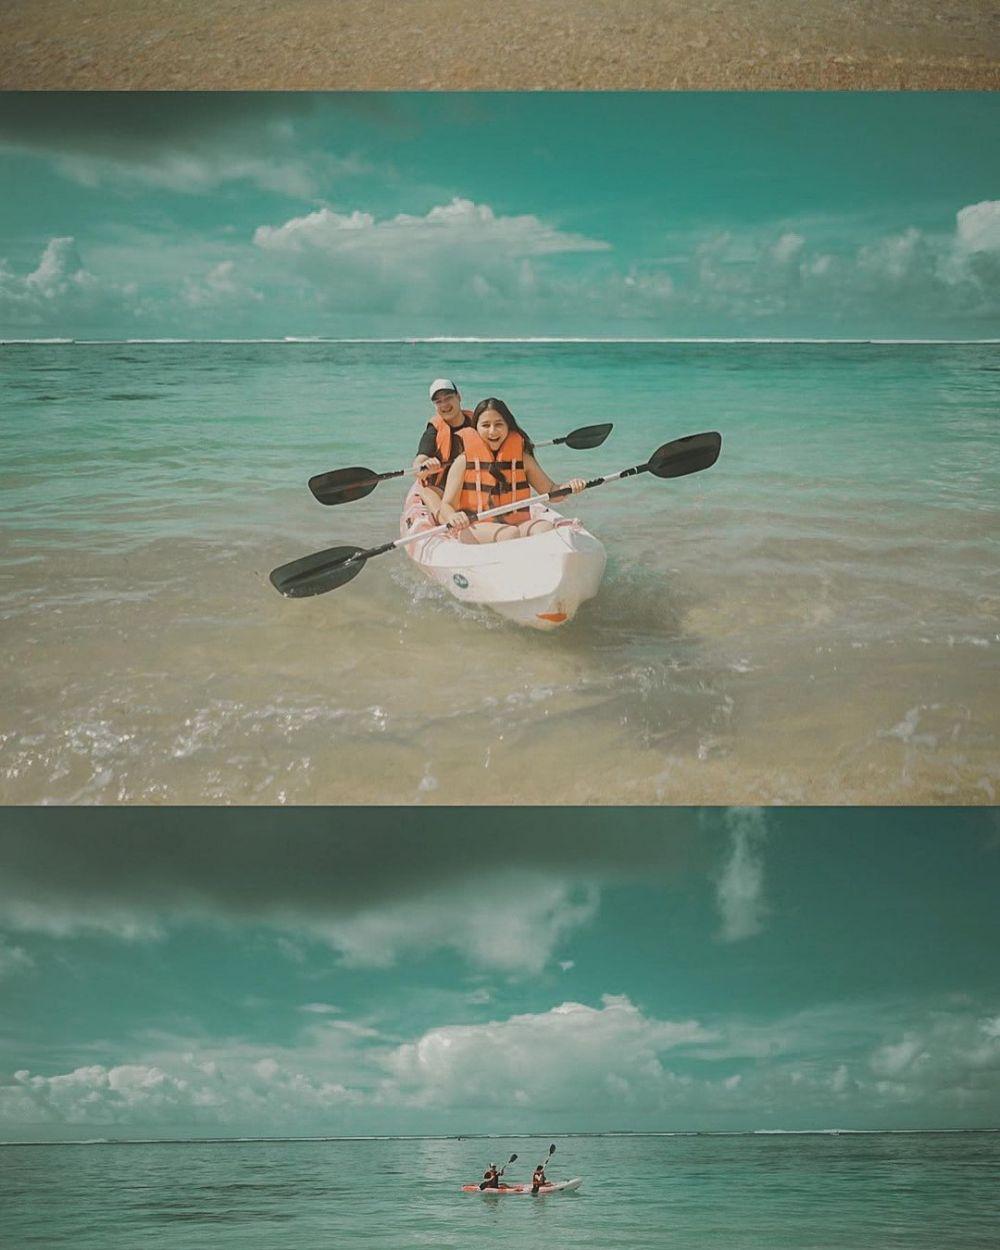 momen jeje soekarno liburan bareng prilly © Instagram